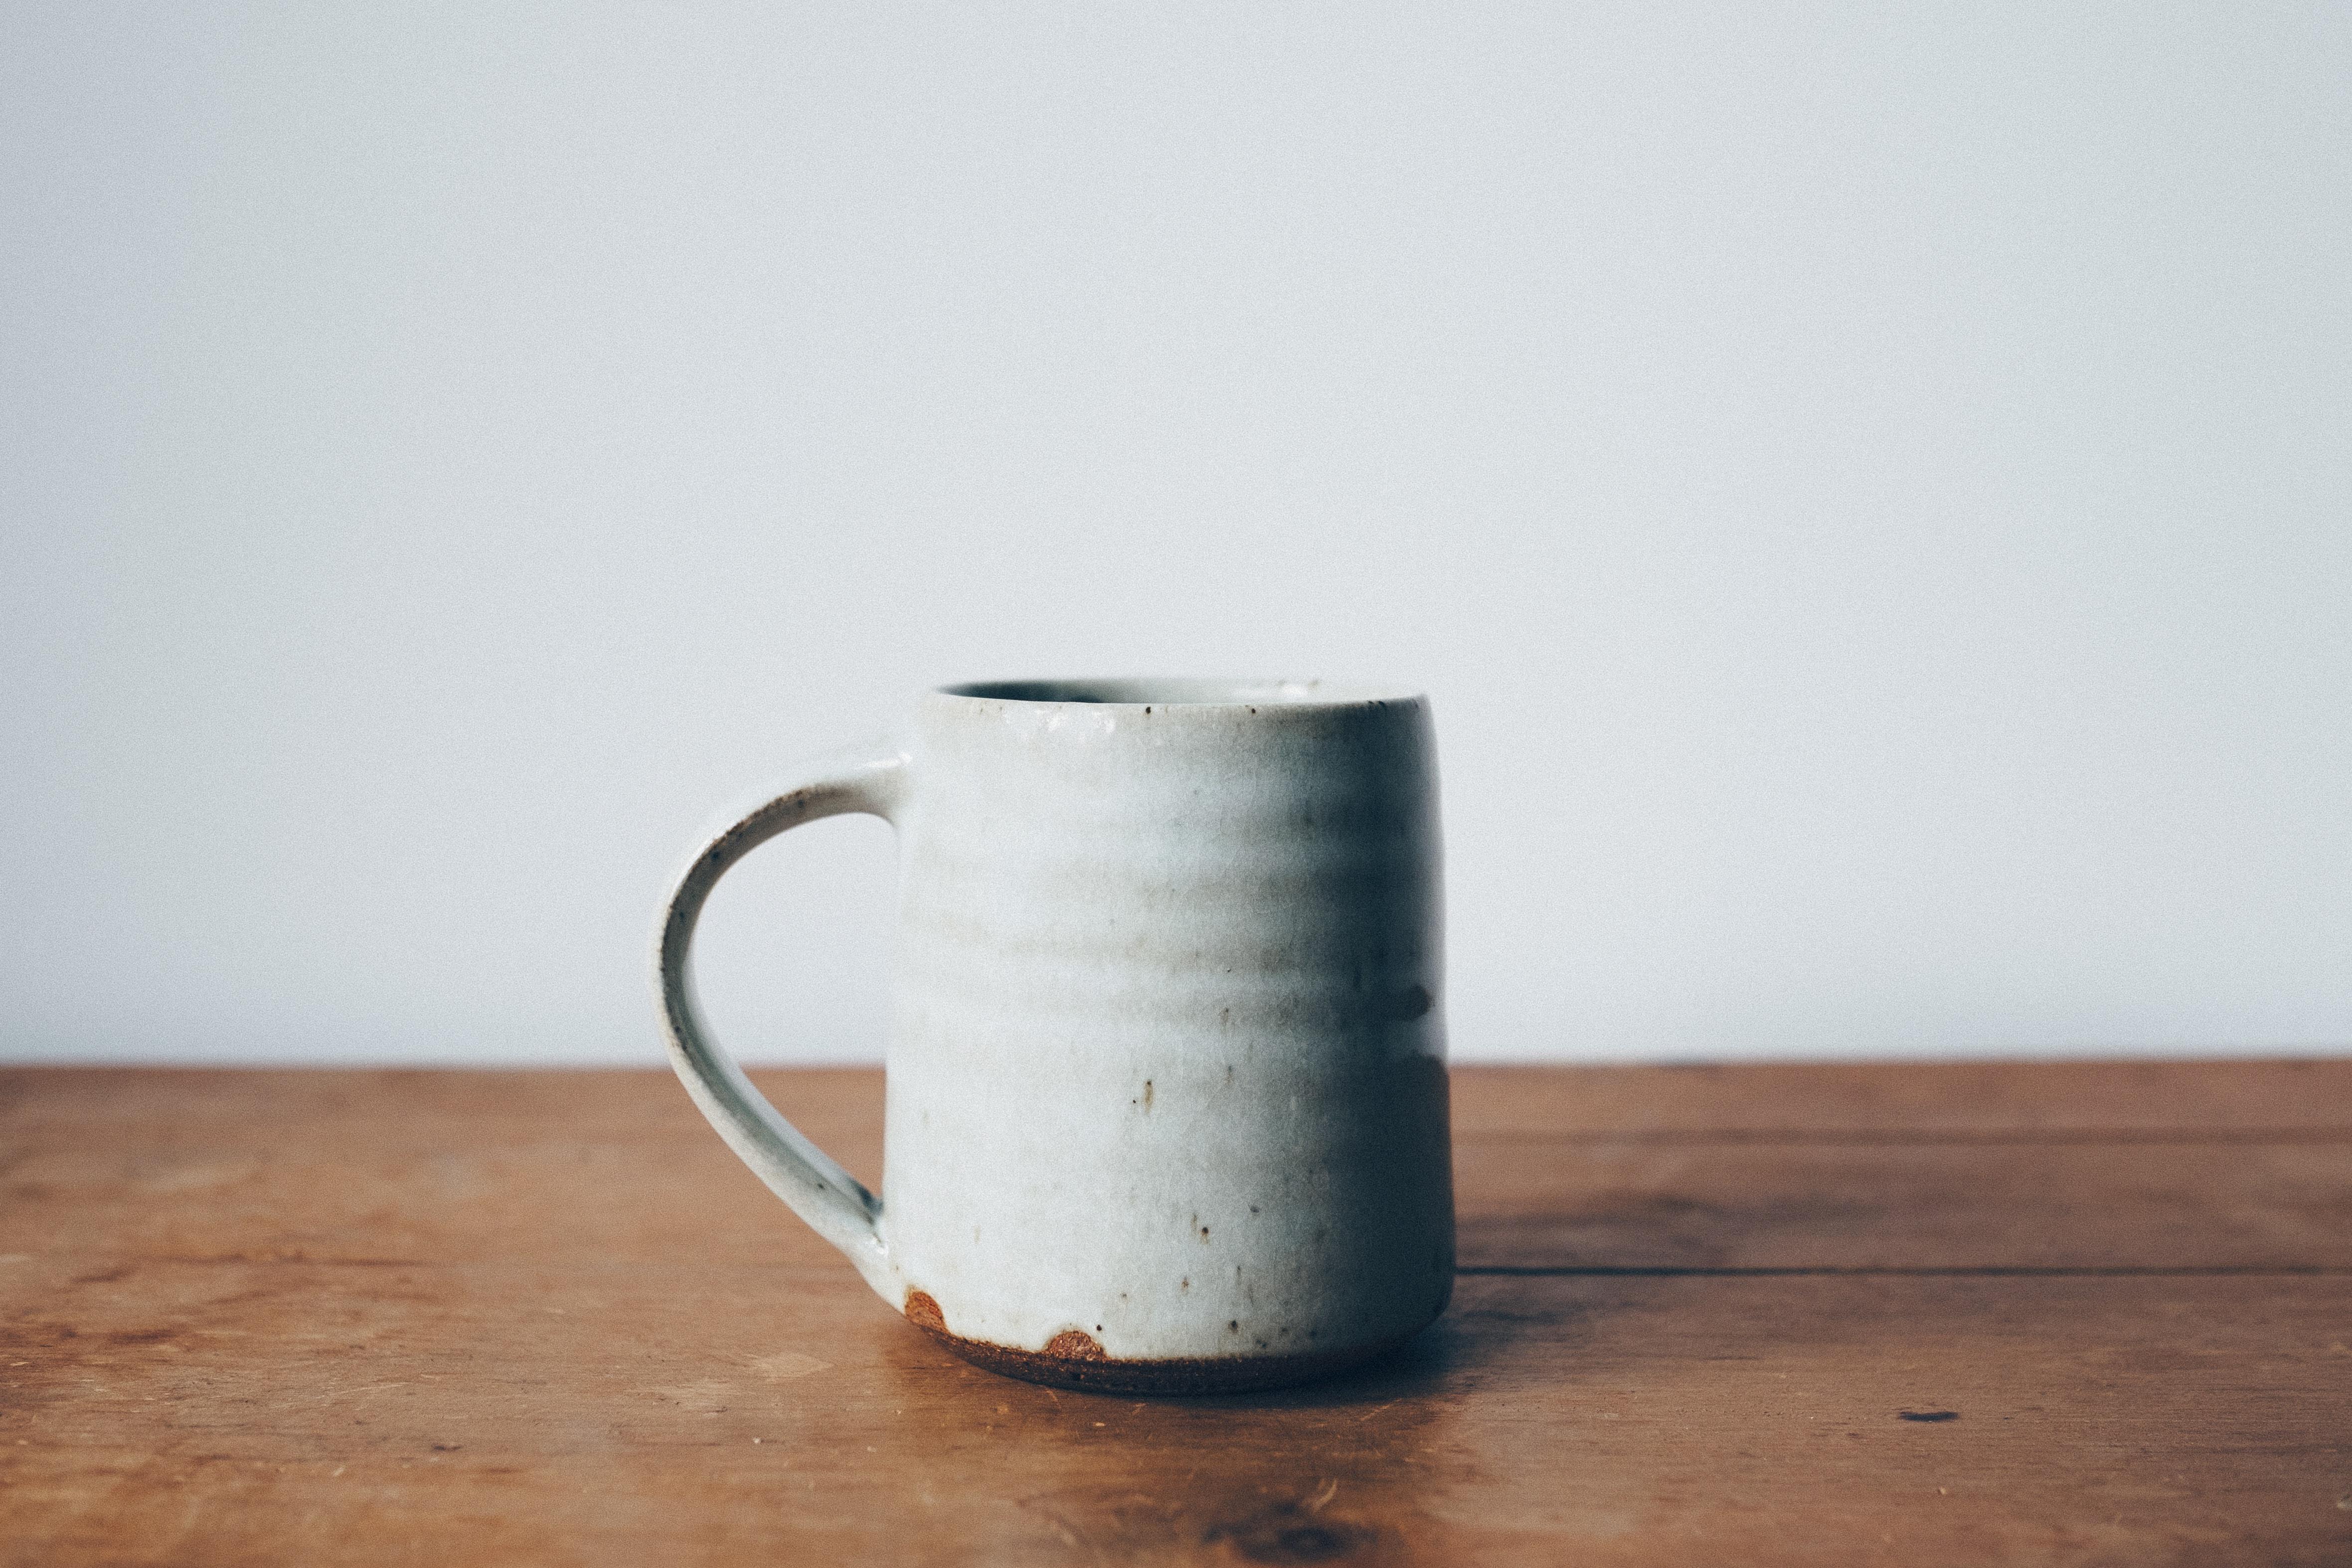 krus keramik Gratis billeder : træ, kop, keramisk, drikke, krus, keramik  krus keramik